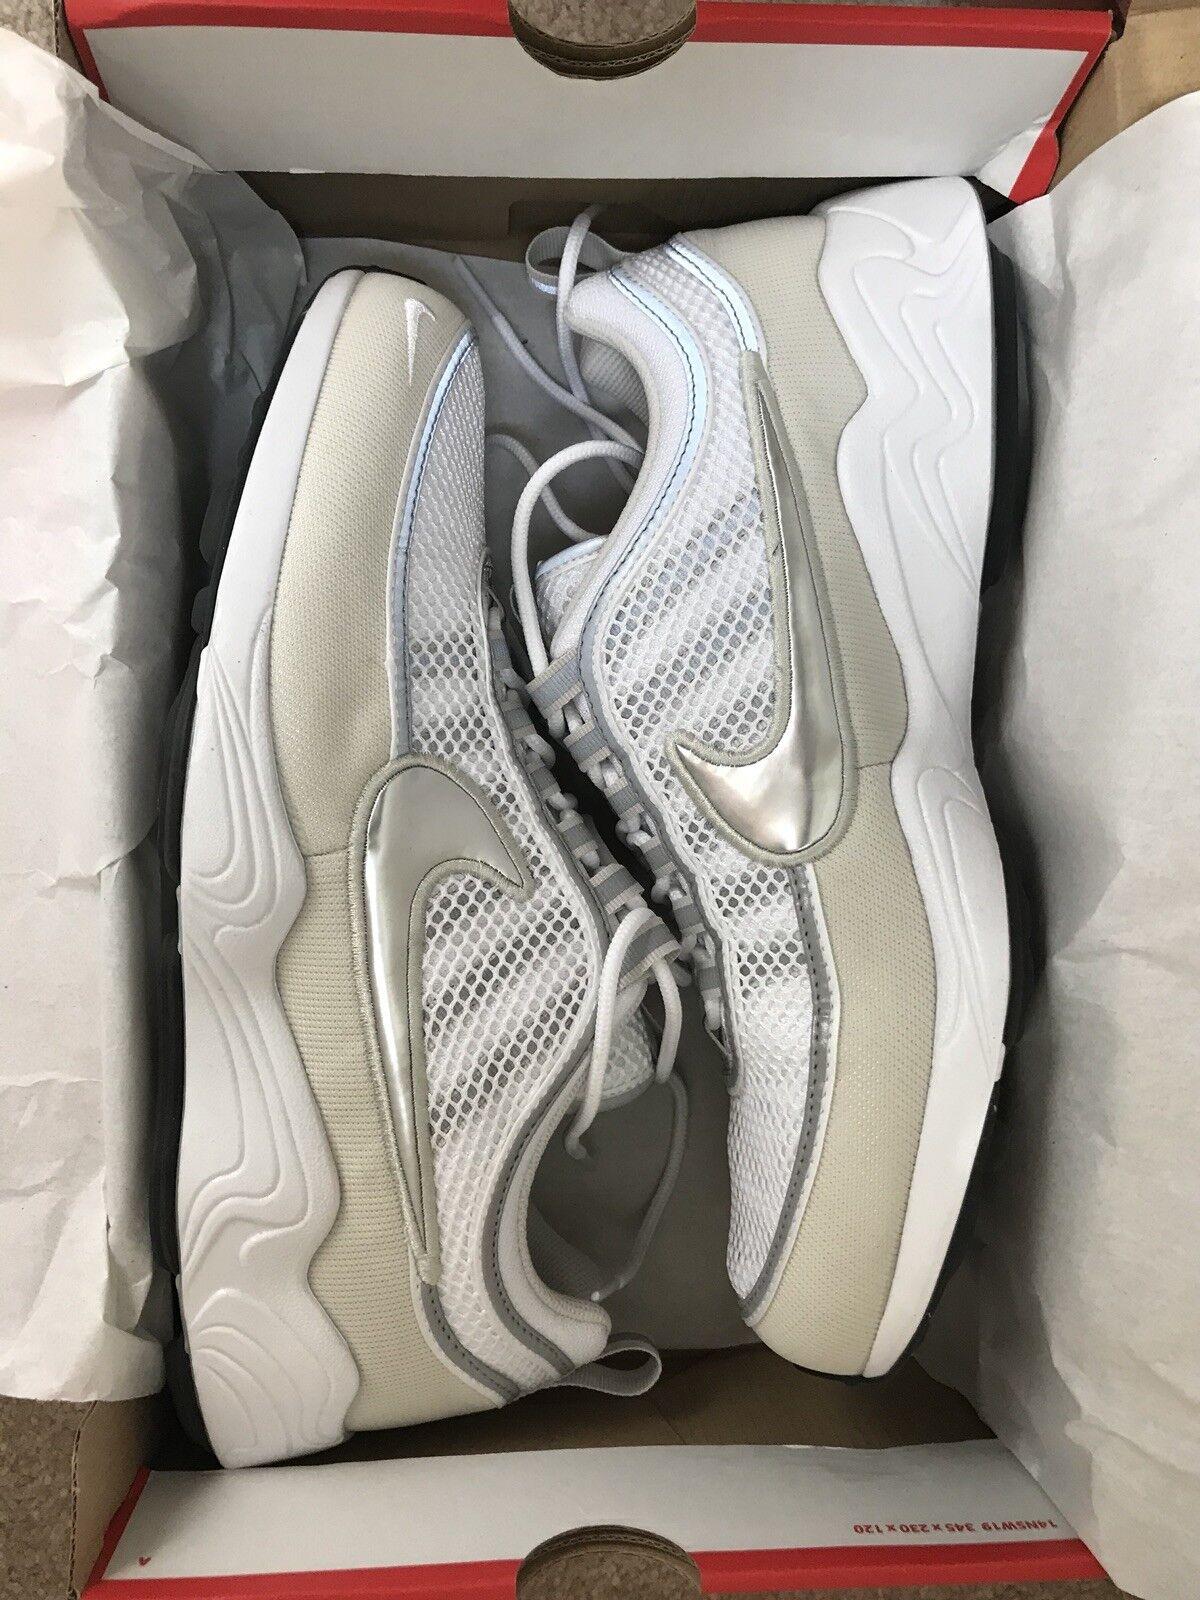 Nike Air Zoom Spiridon / '16 White / Spiridon Silver US 12 299230